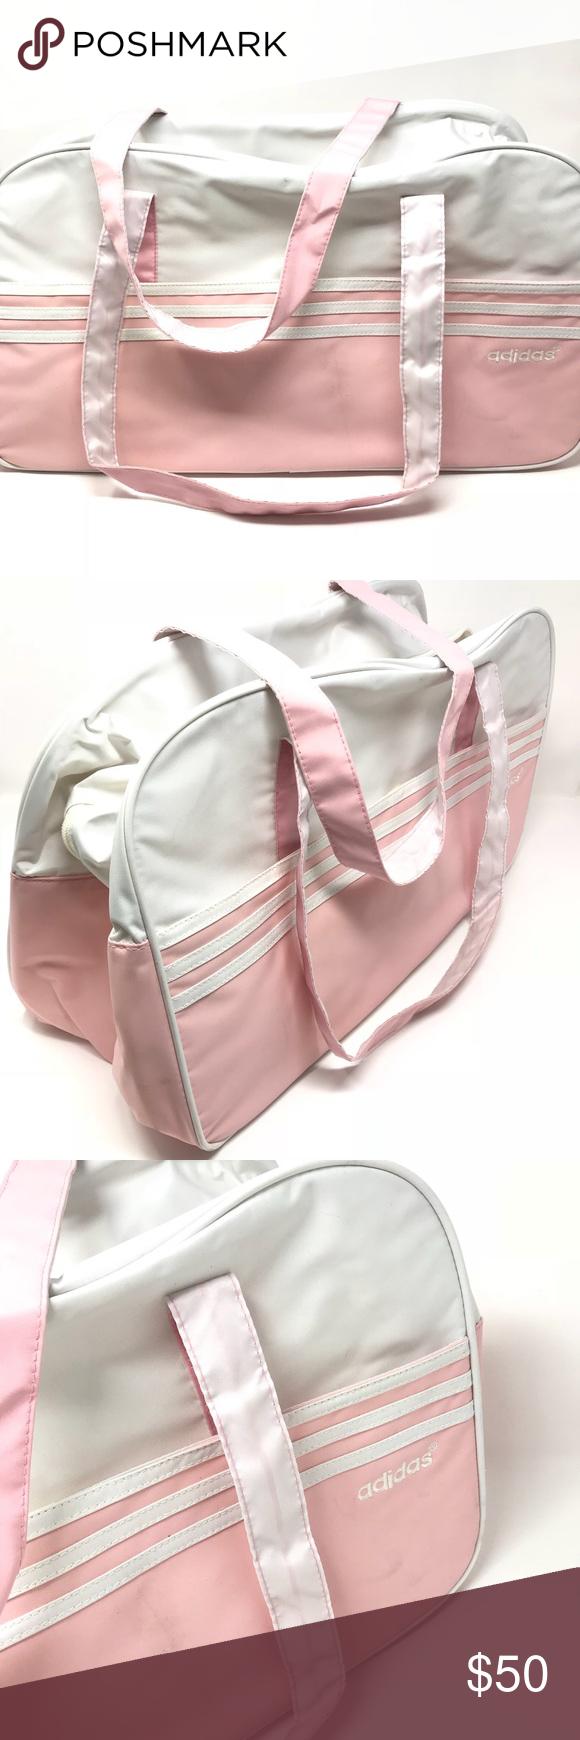 "ce6370af1764 EUC Adidas Light Pink   White 3 Stripe Gym Bag EUC Adidas Light Pink    White 3 Stripe Gym Bag B156    20"" Length"